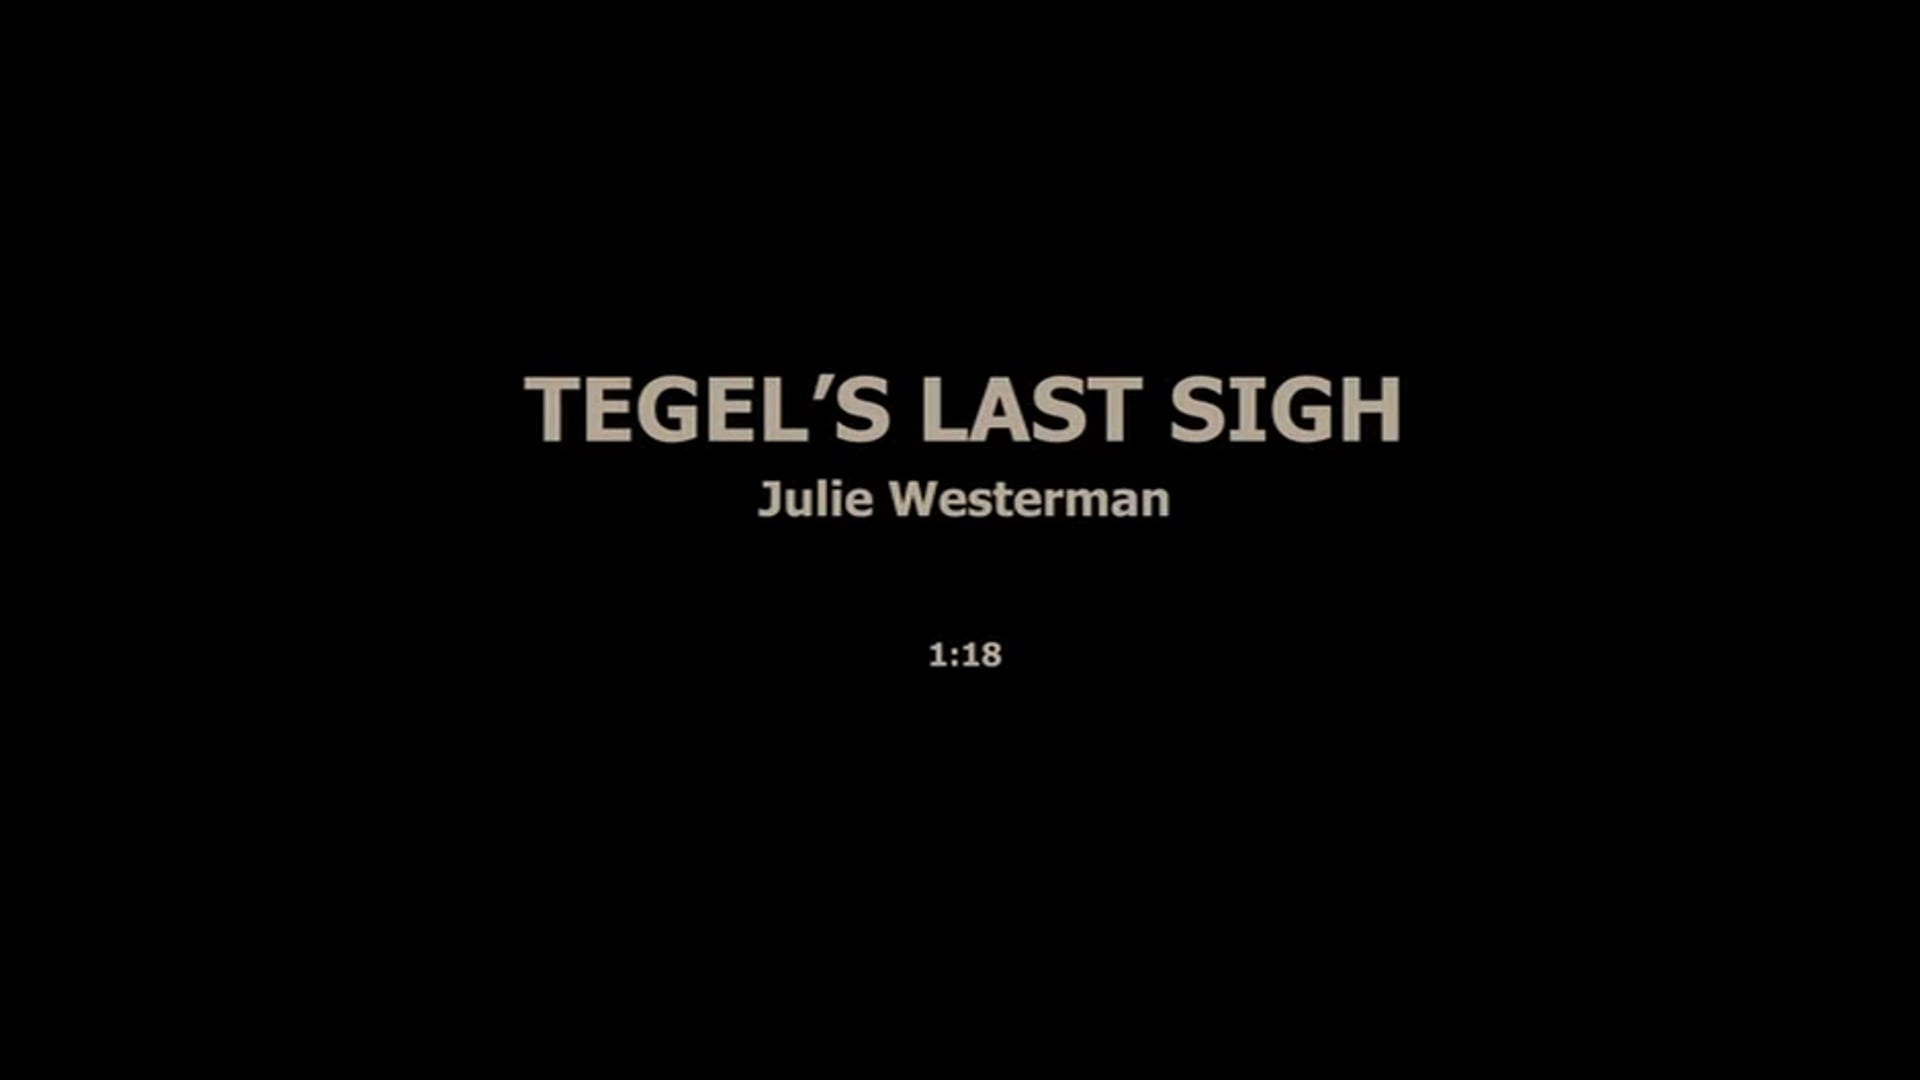 TEGEL'S LAST SIGH/2 - JULIE WESTERMAN